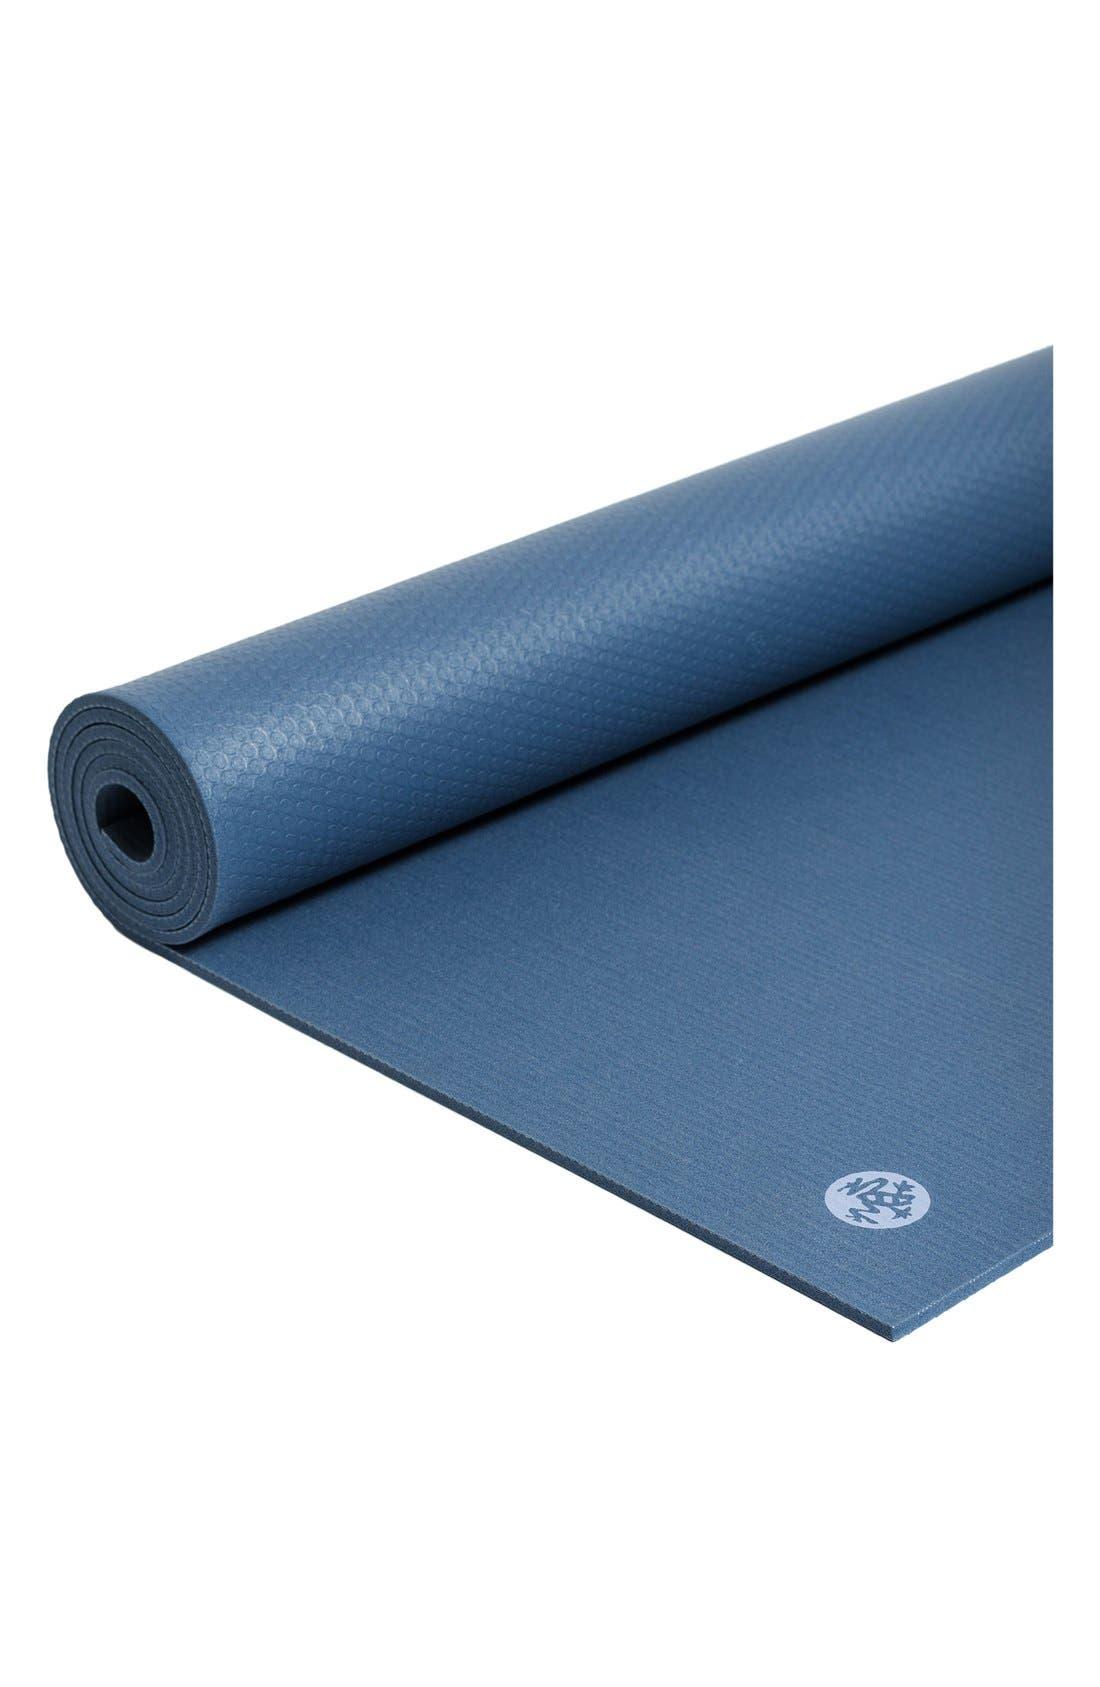 'PRO71 - Odyssey' Yoga Mat,                             Alternate thumbnail 3, color,                             401